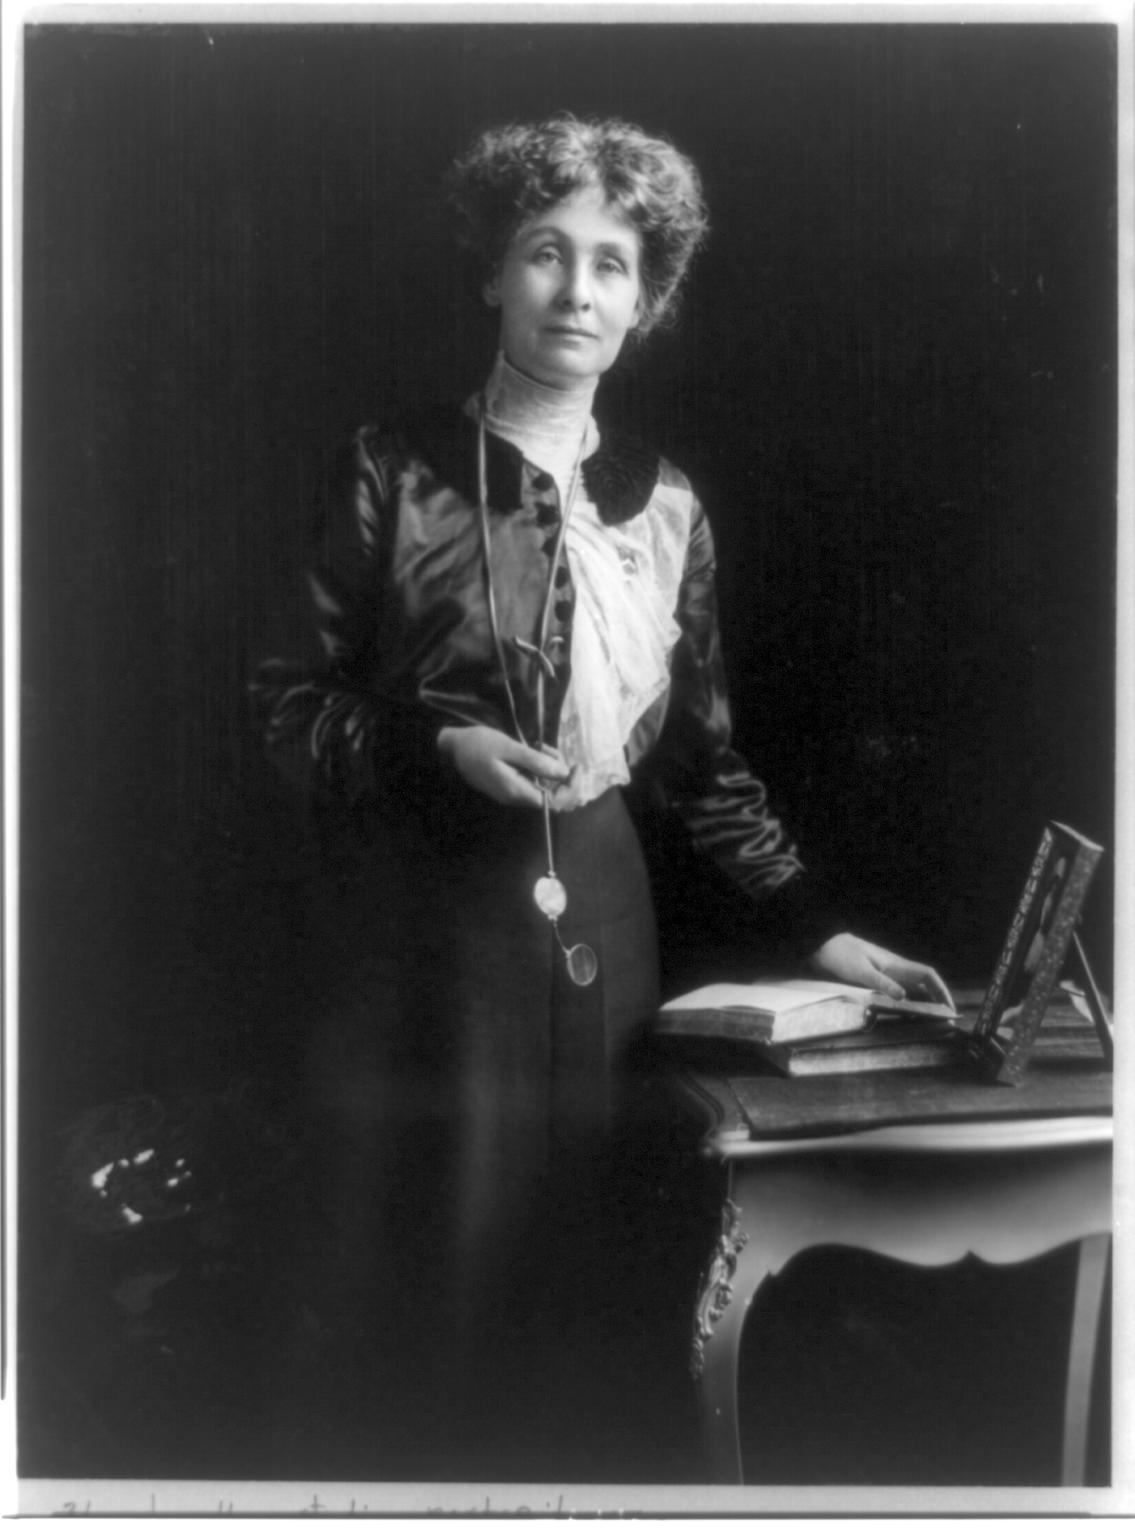 Retrato de Emmeline Pankhurst en el año 1913. Crédito: Wikipedia, Matzene